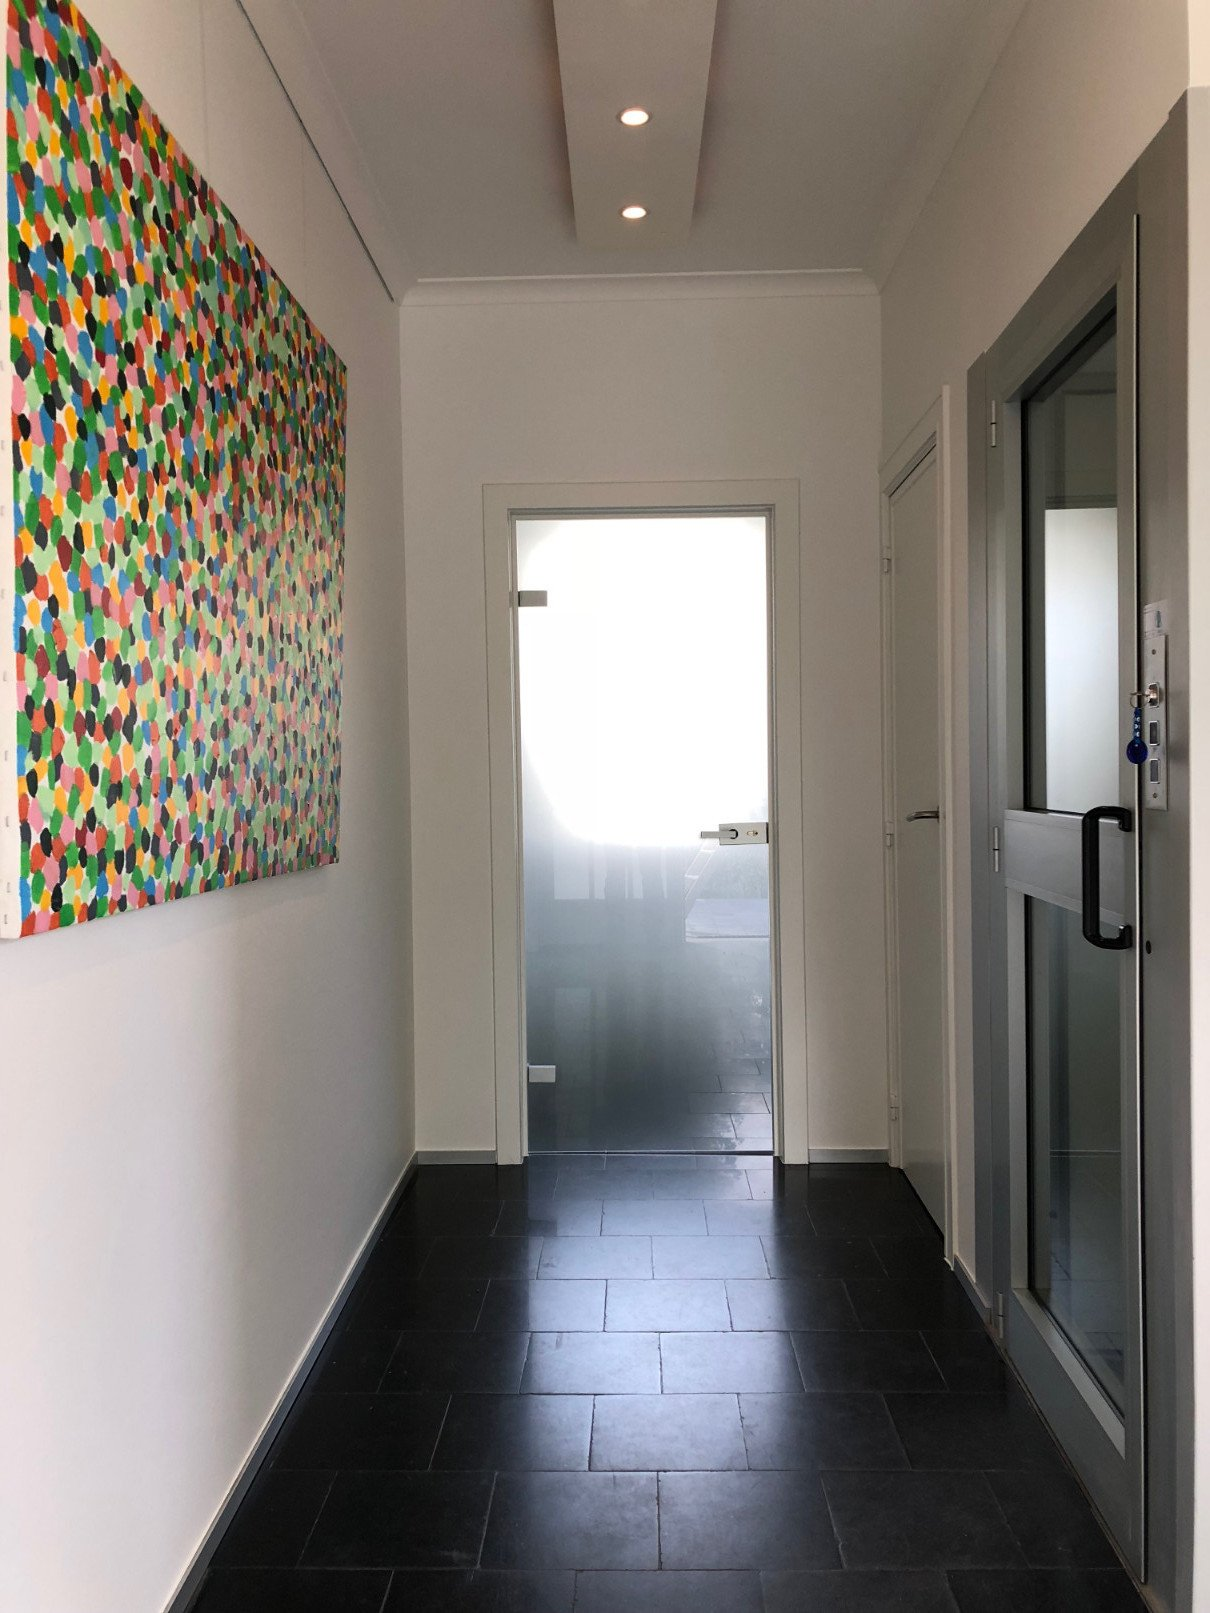 Rietveldprojects-Villa Were Di - Te Koop : Te Huur (per week)5